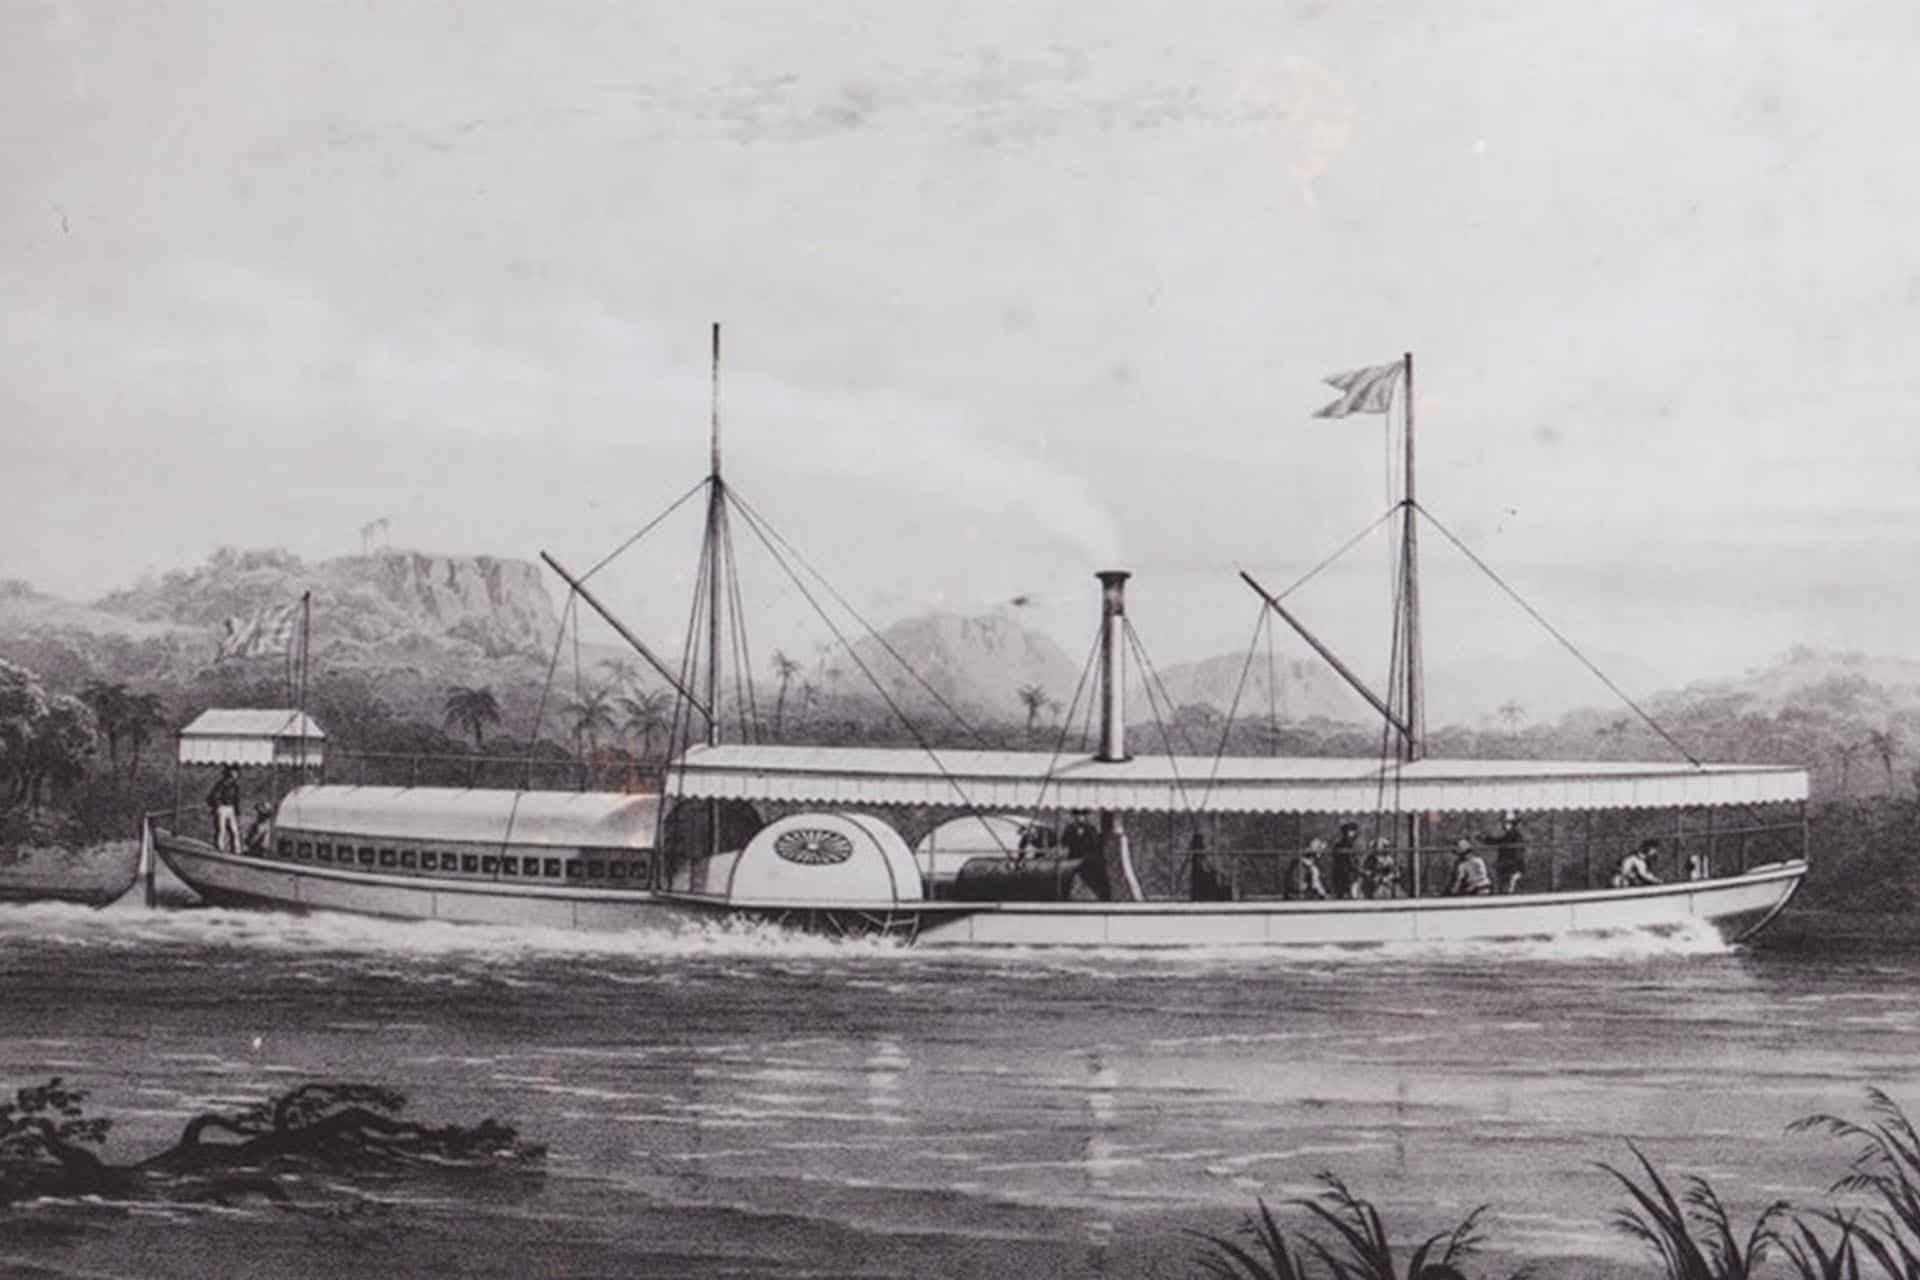 Raikane River Boat History